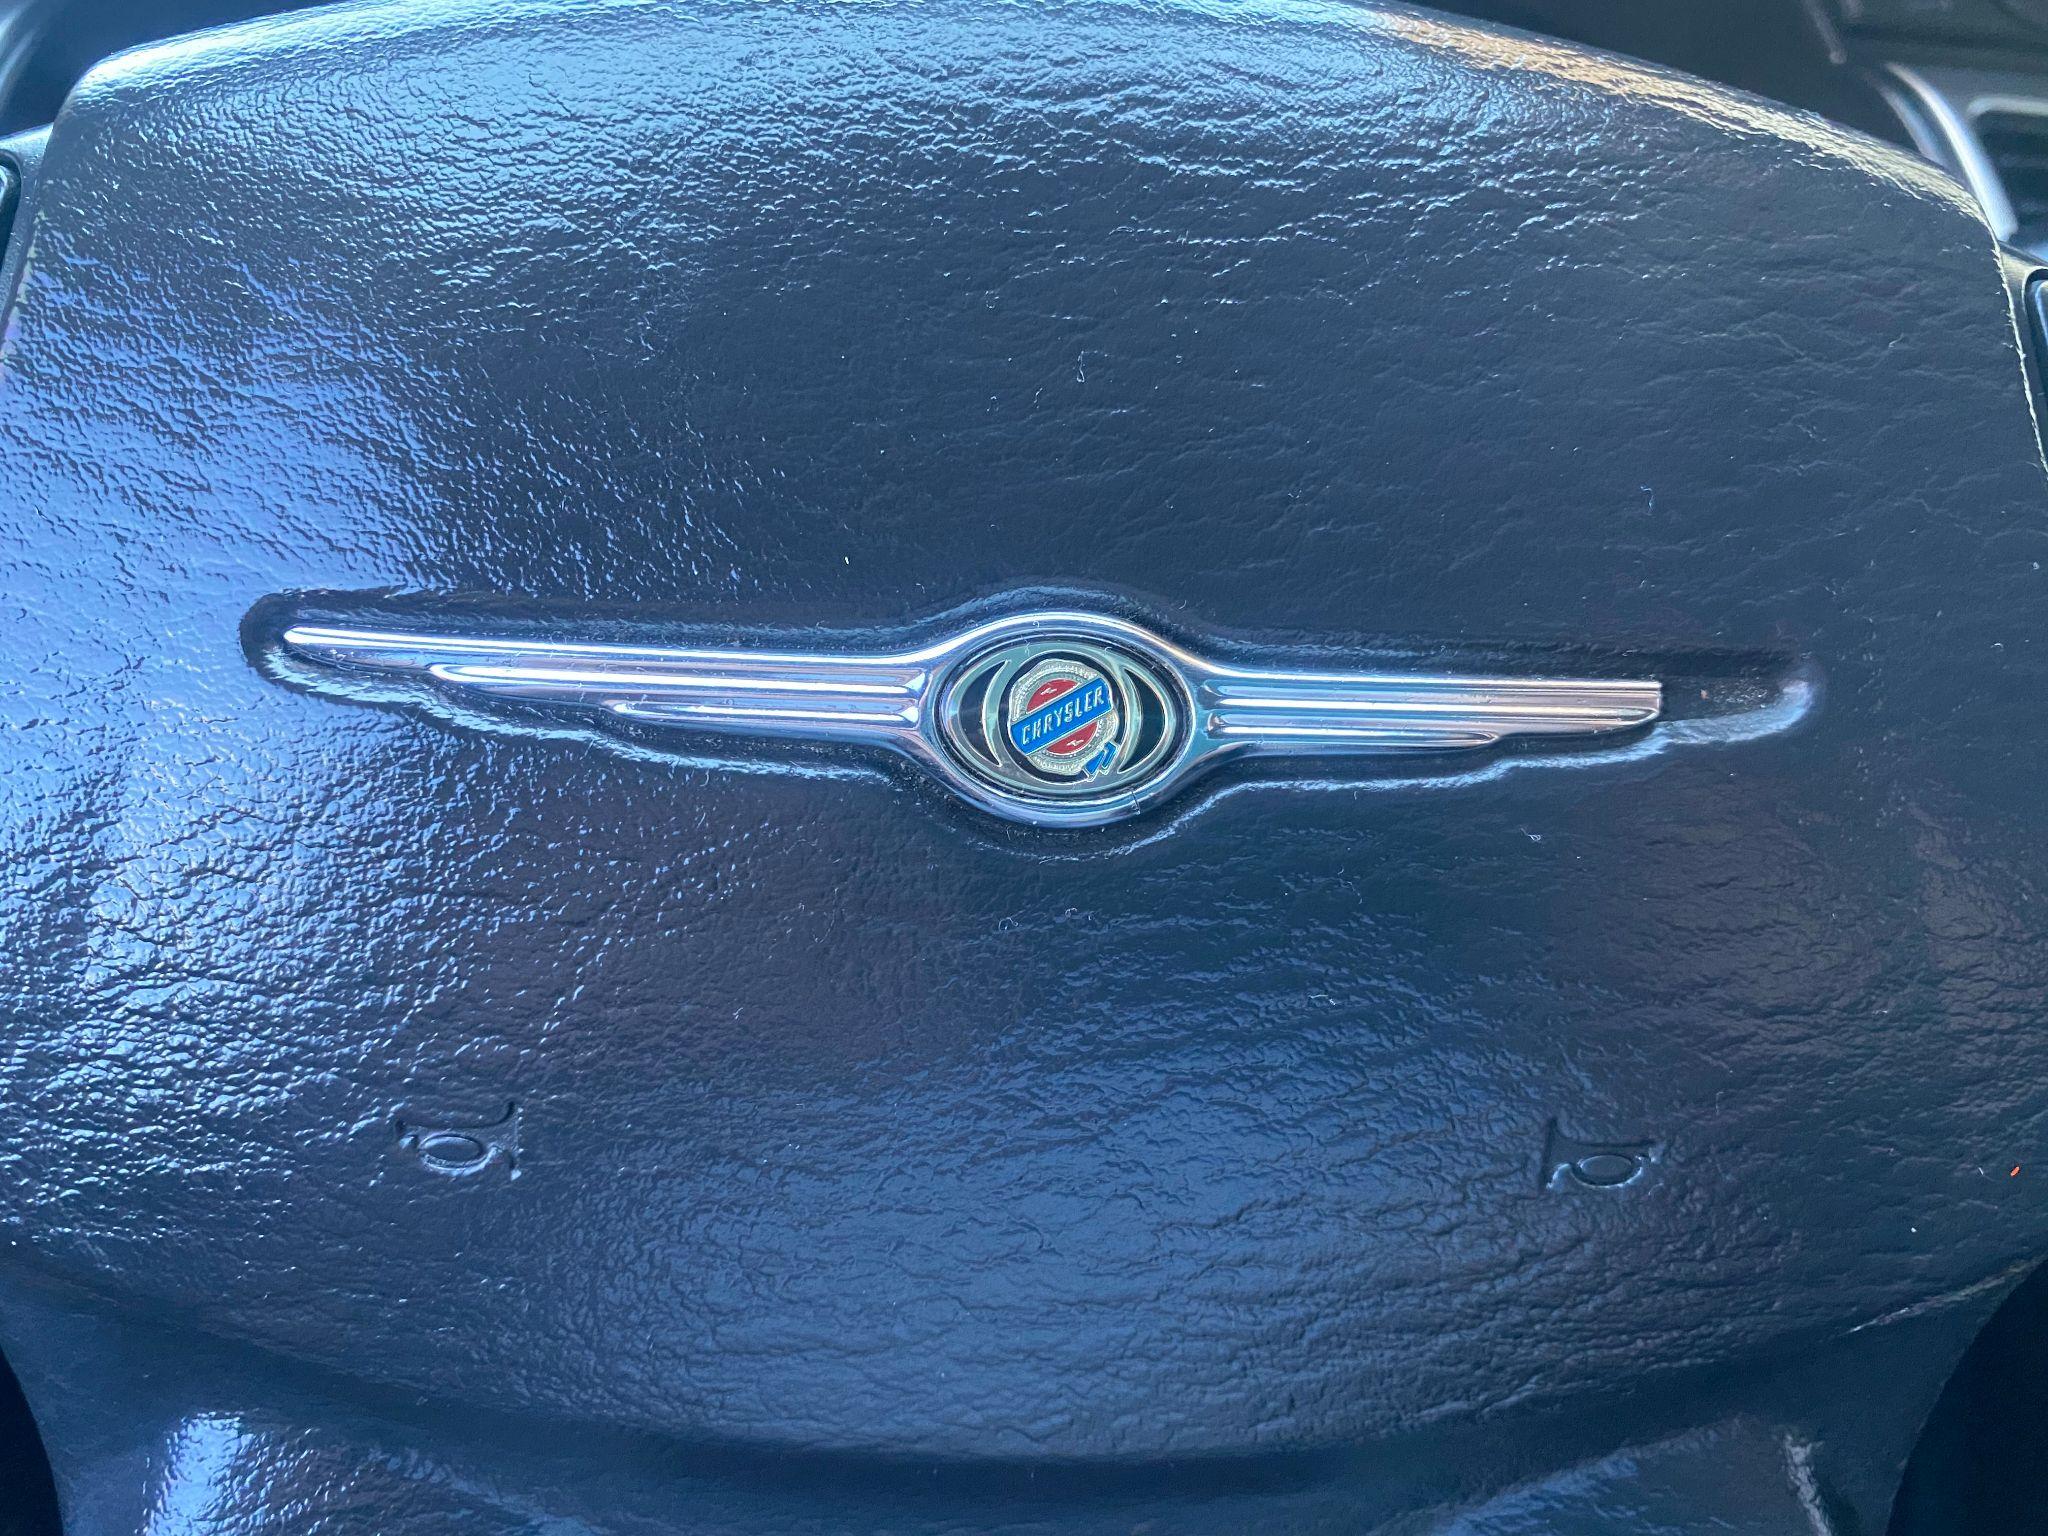 2004 Chrysler Pacifica 4dr Wagon